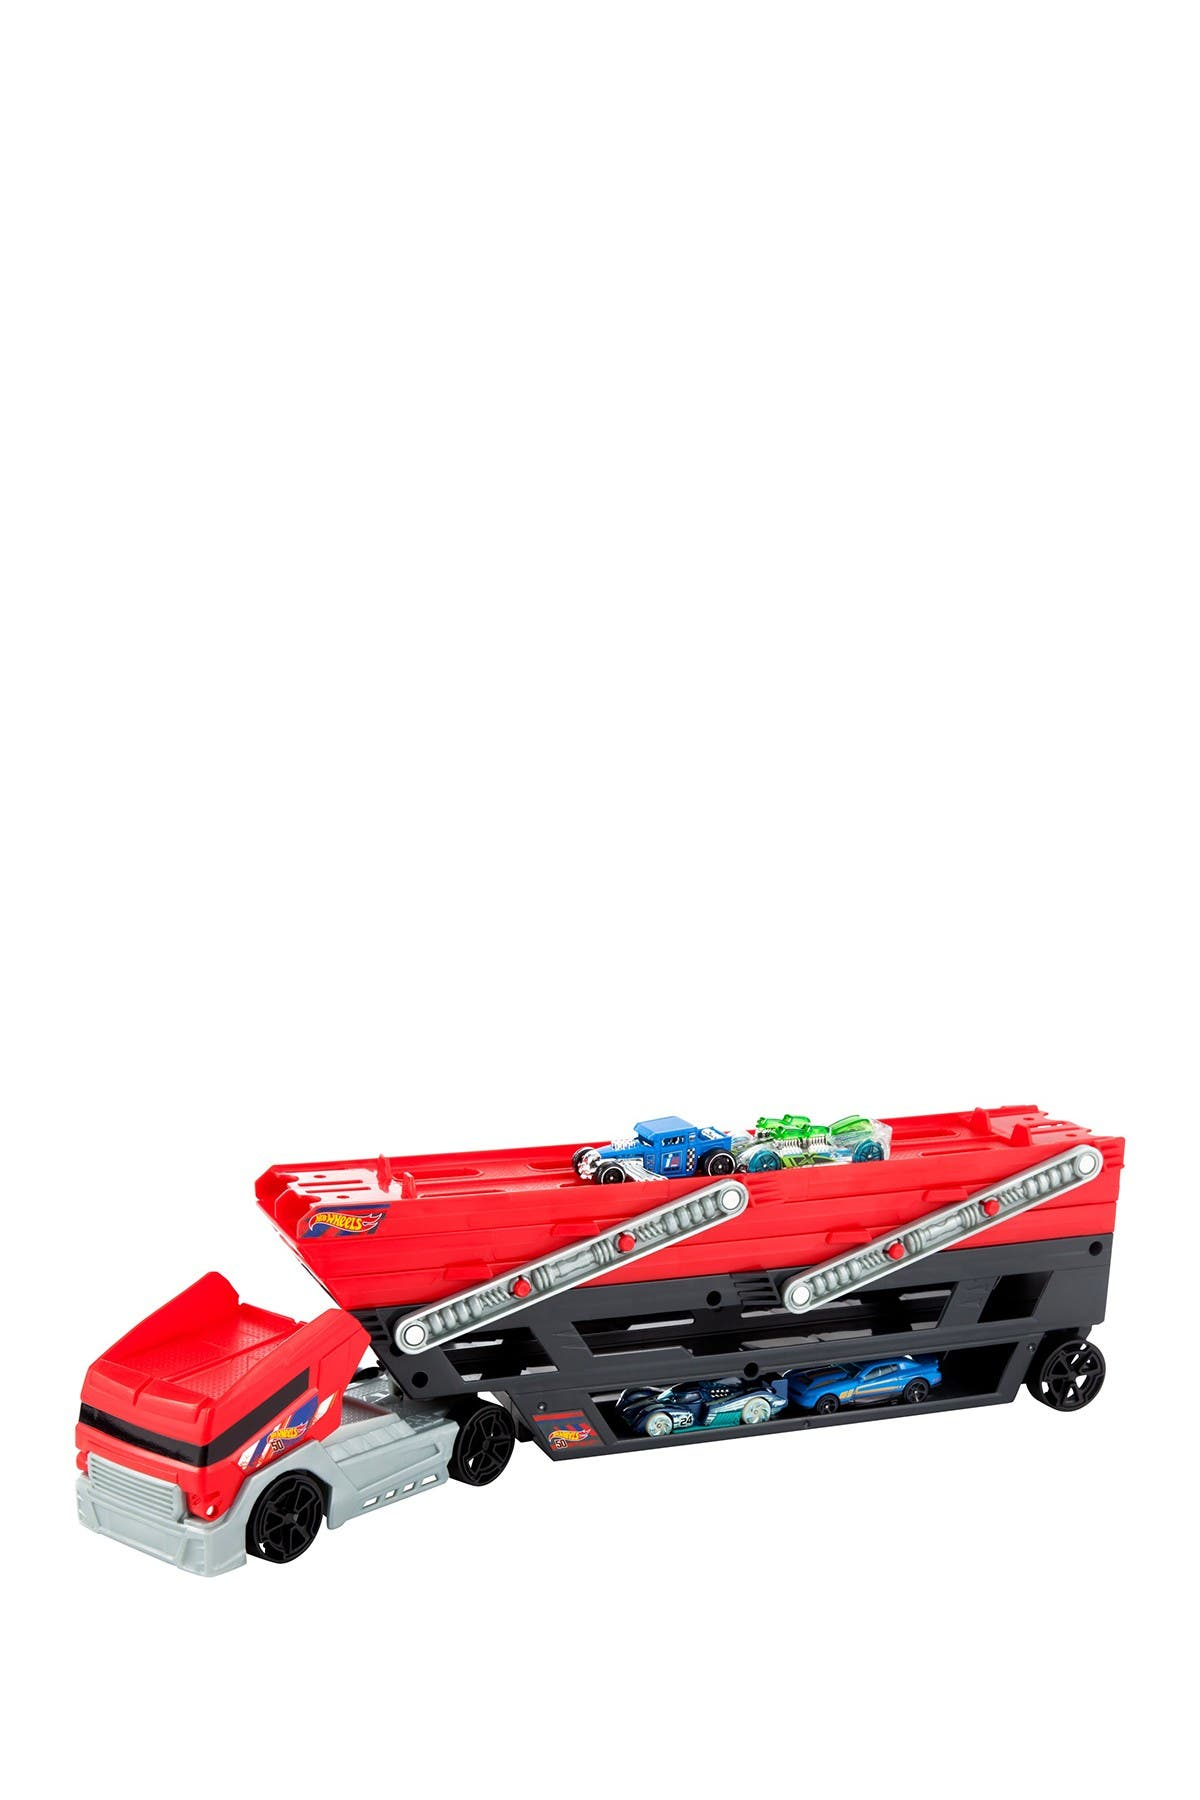 Image of Mattel Hot Wheels Mega Hauler Set